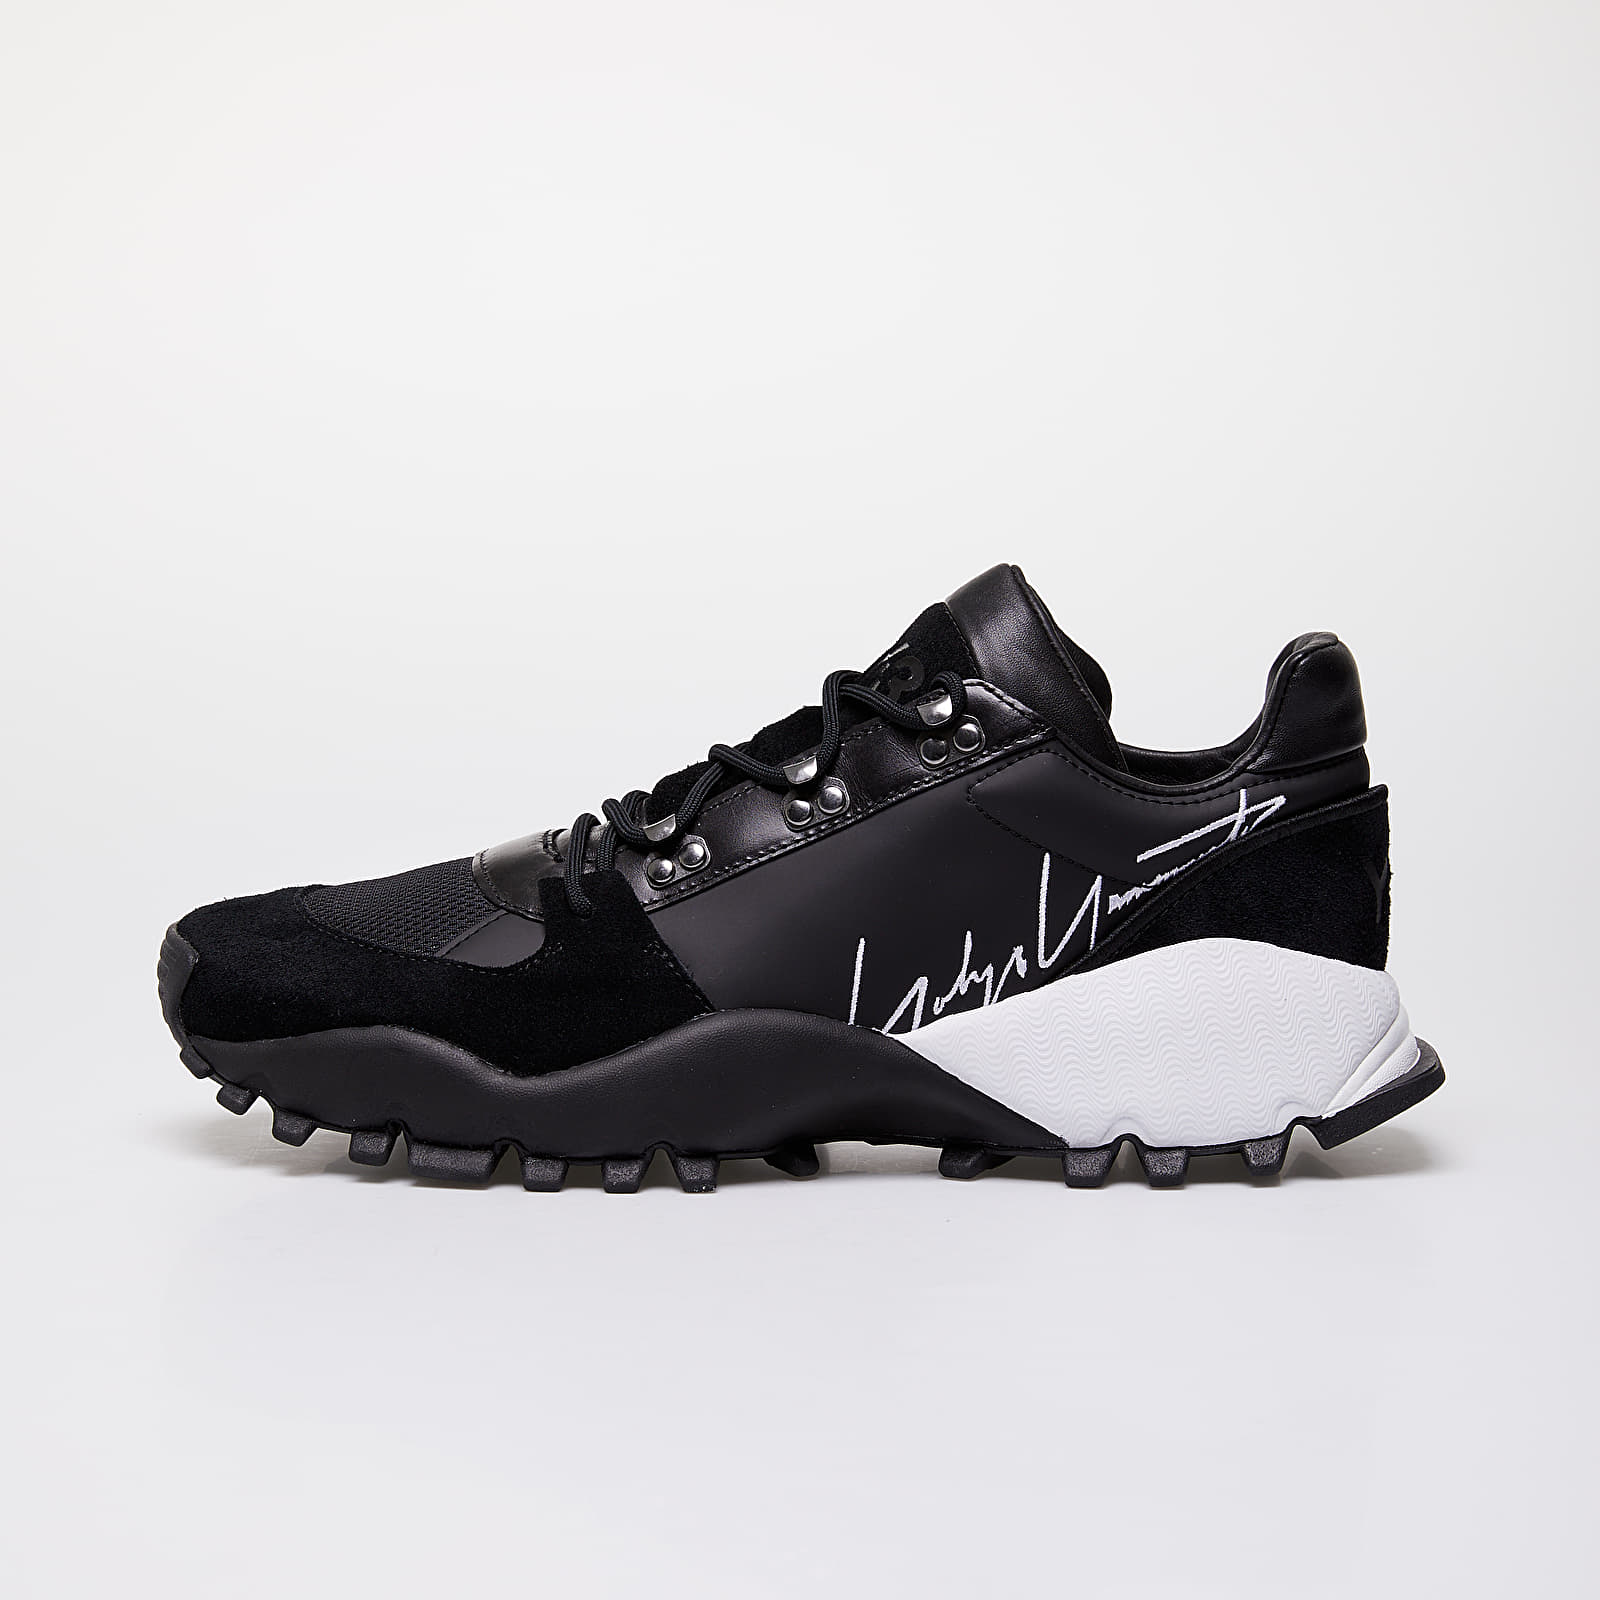 Men's shoes Y-3 Kyoi Trail Black-Y3/ Ftwr White/ Black-Y3